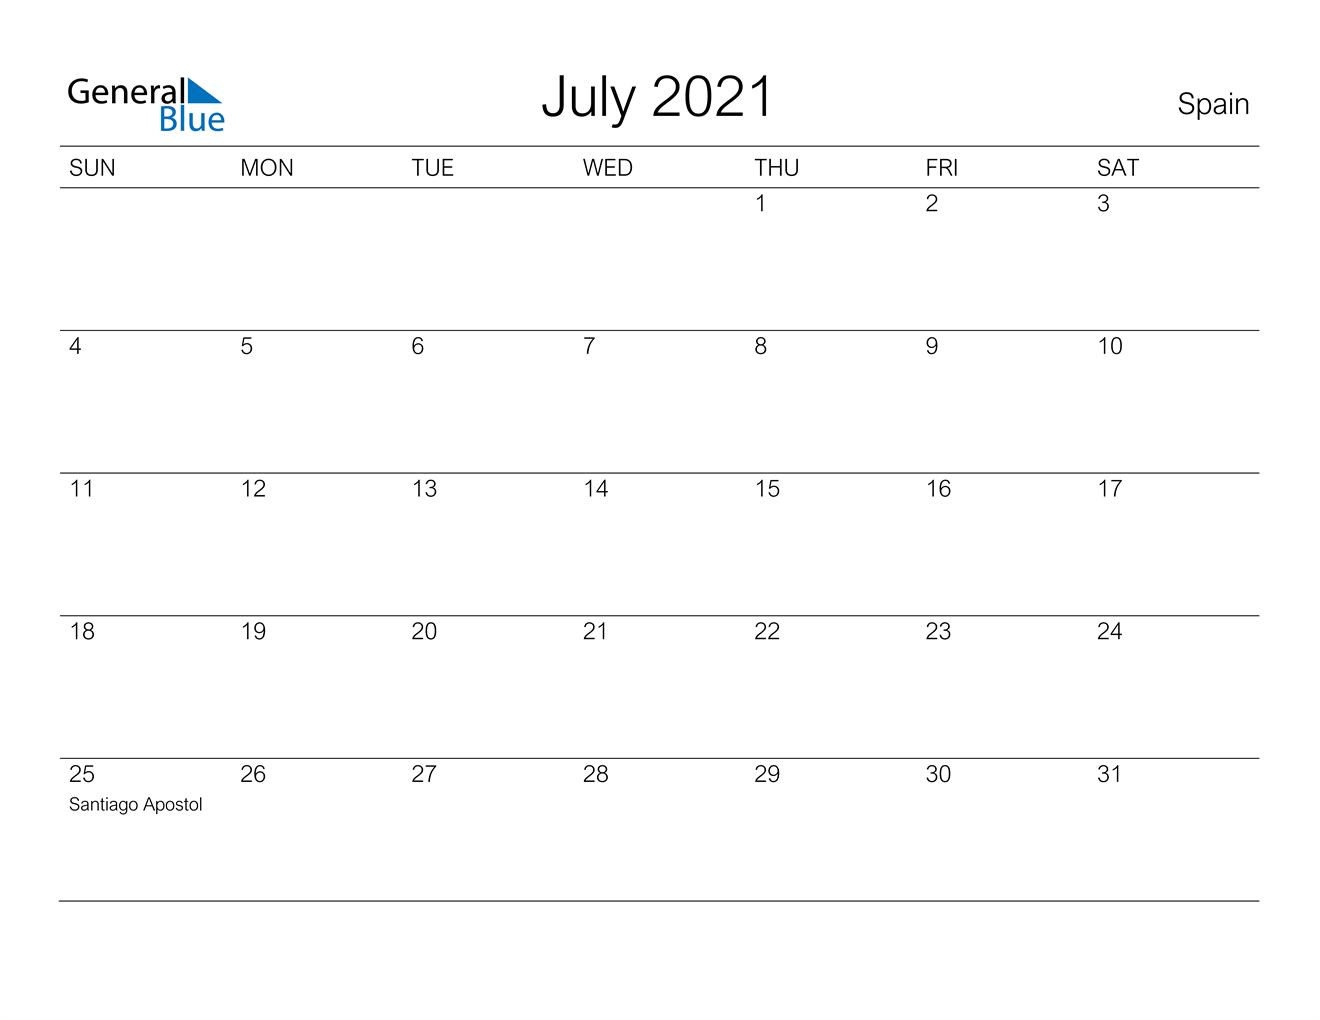 July 2021 Calendar - Spain